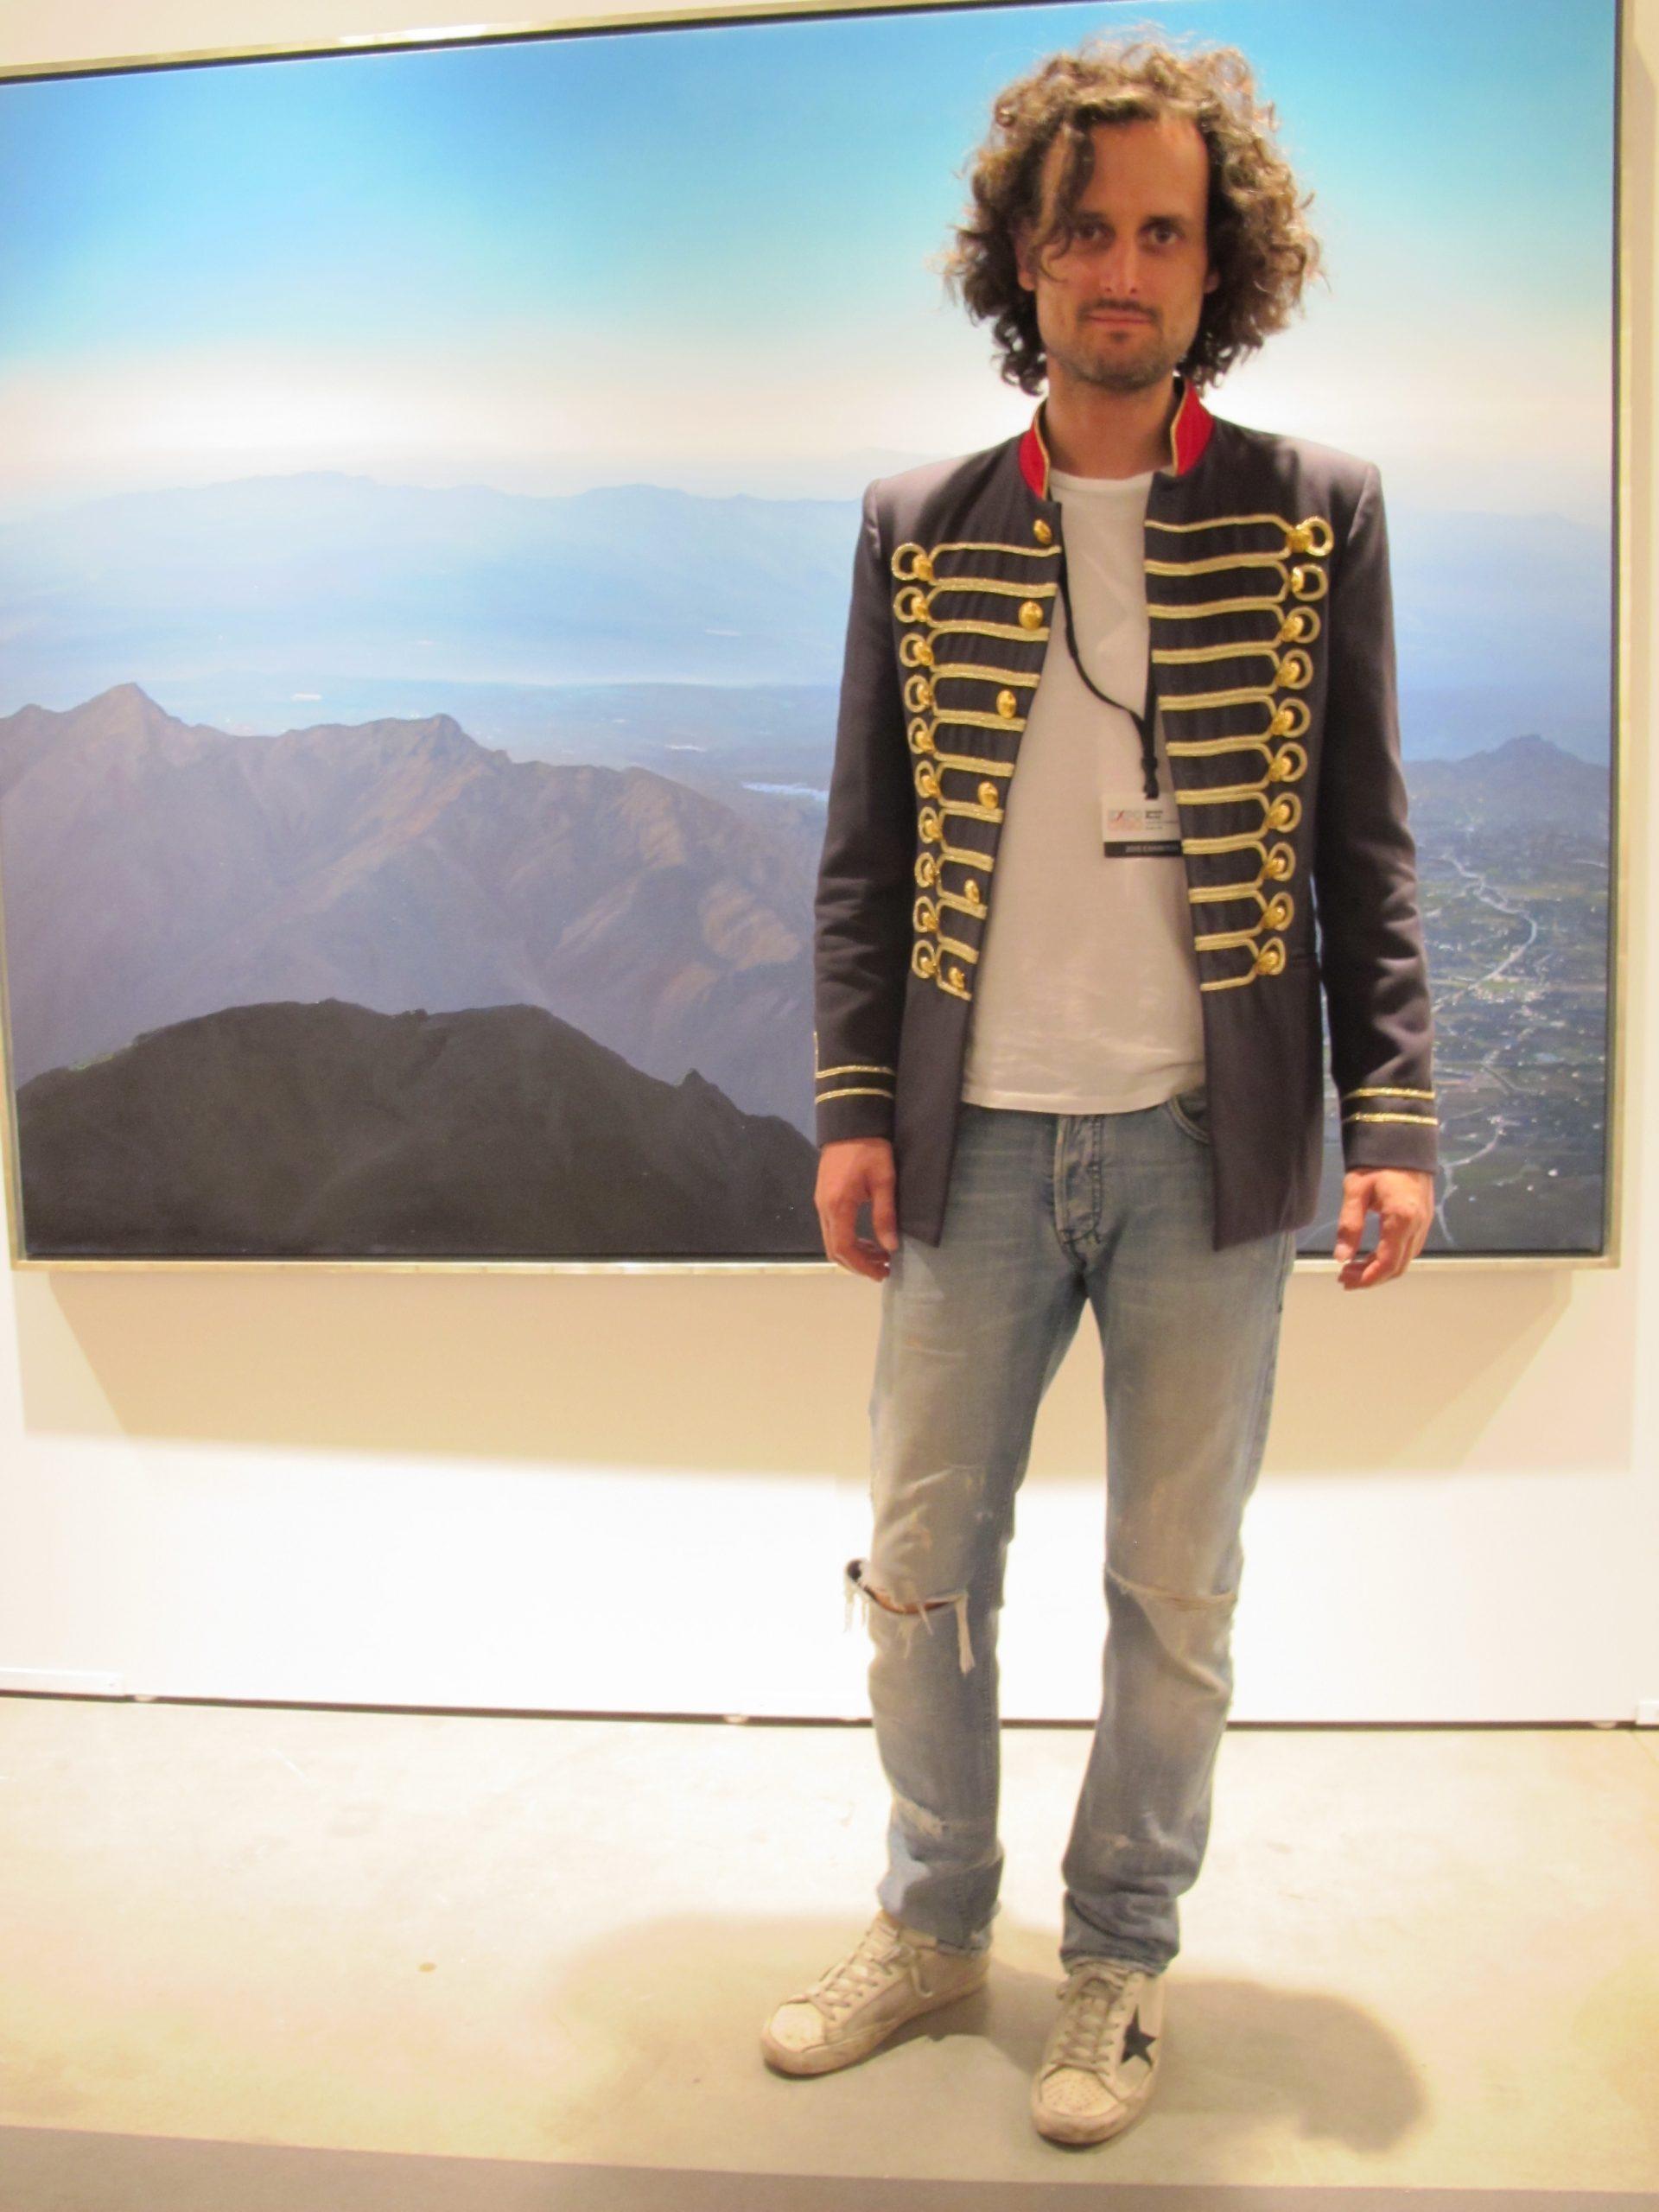 Ignacio Murua of Local Arte Contemporaneo